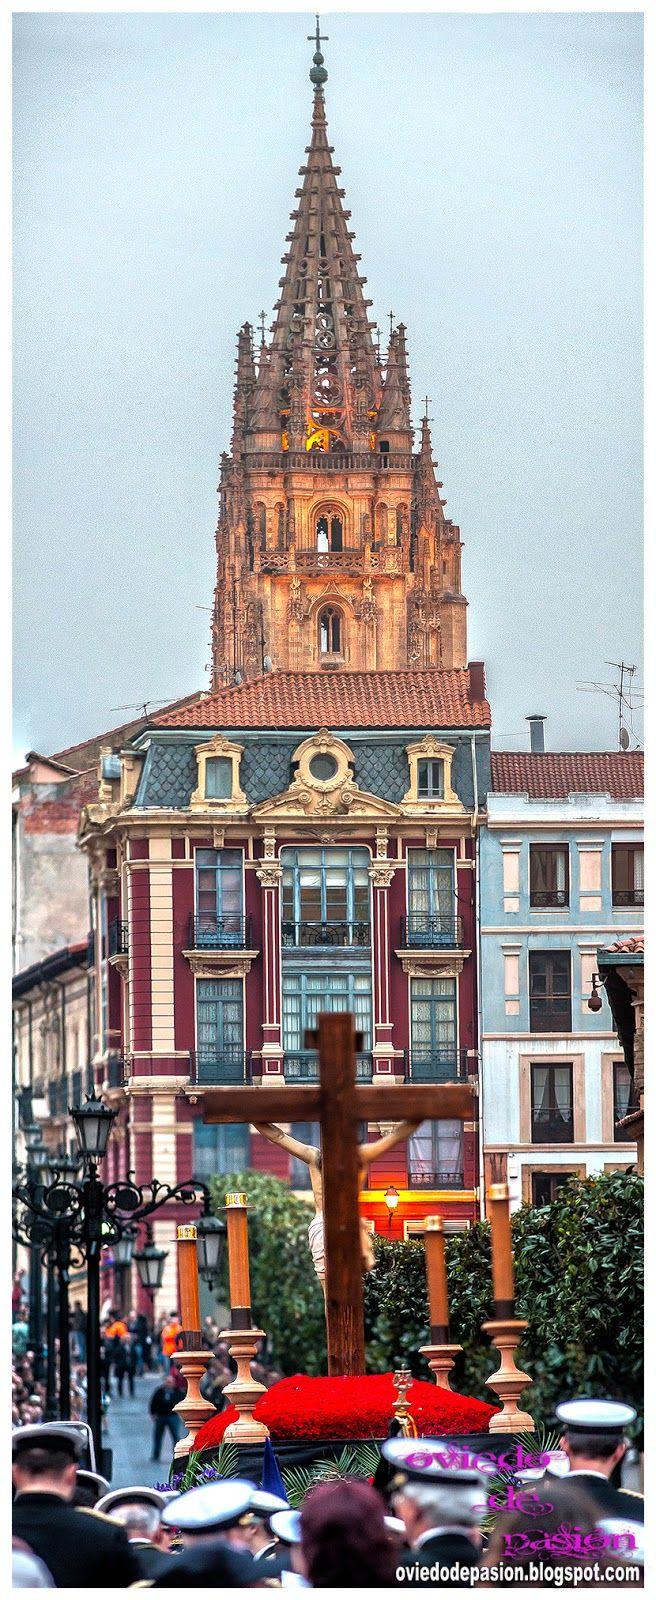 Oviedo De Pasión: Semana Santa Oviedo 2014: Procesión del Stmo. Cristo de la Misericordia (II)